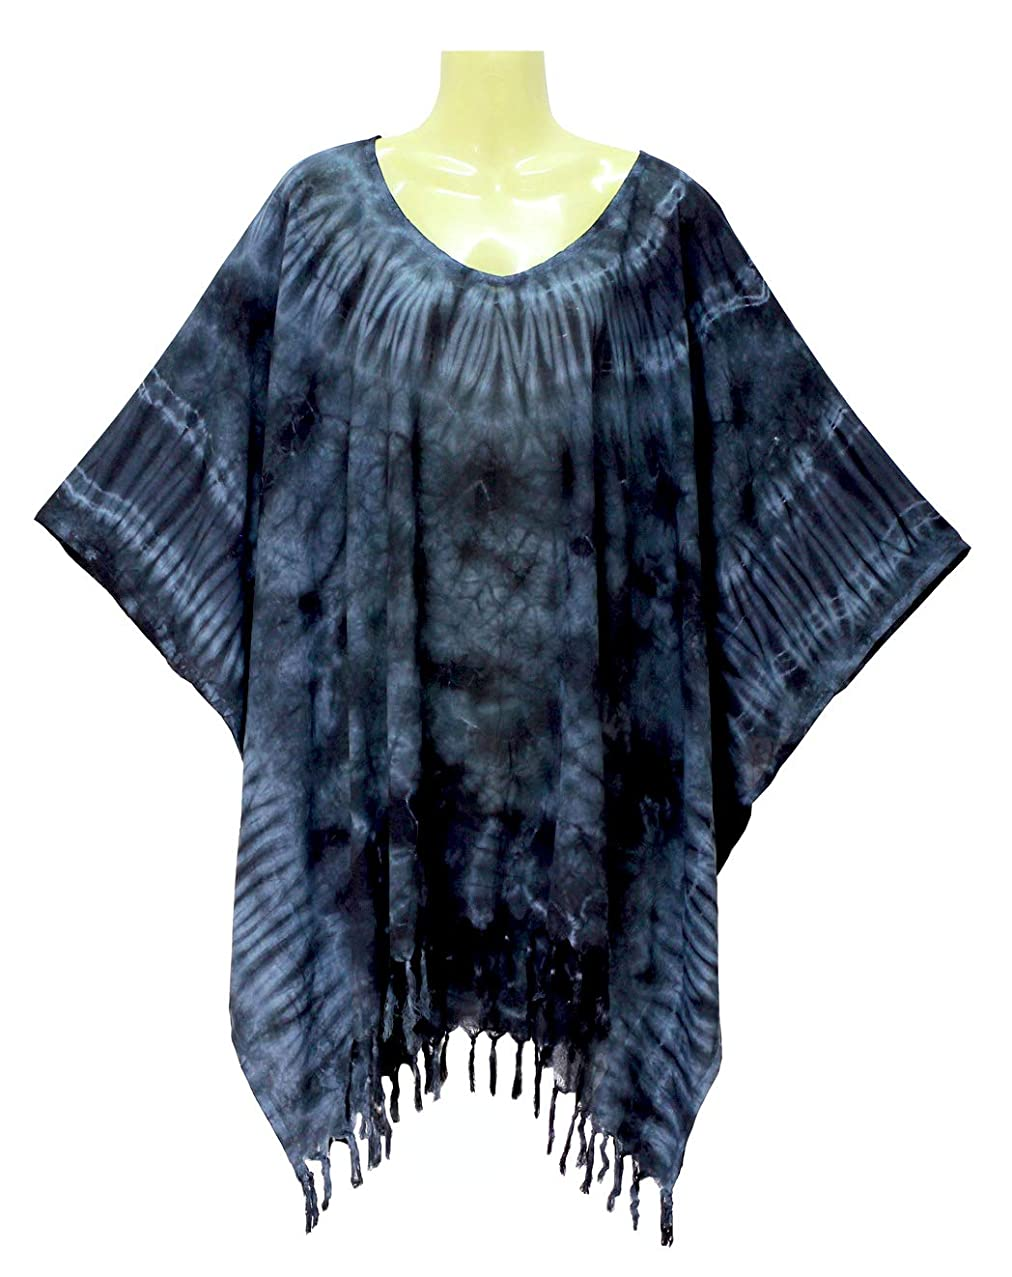 ATM Kaftan Caftan Poncho Tops Blouse Real Handmade Tie dye Plus Size